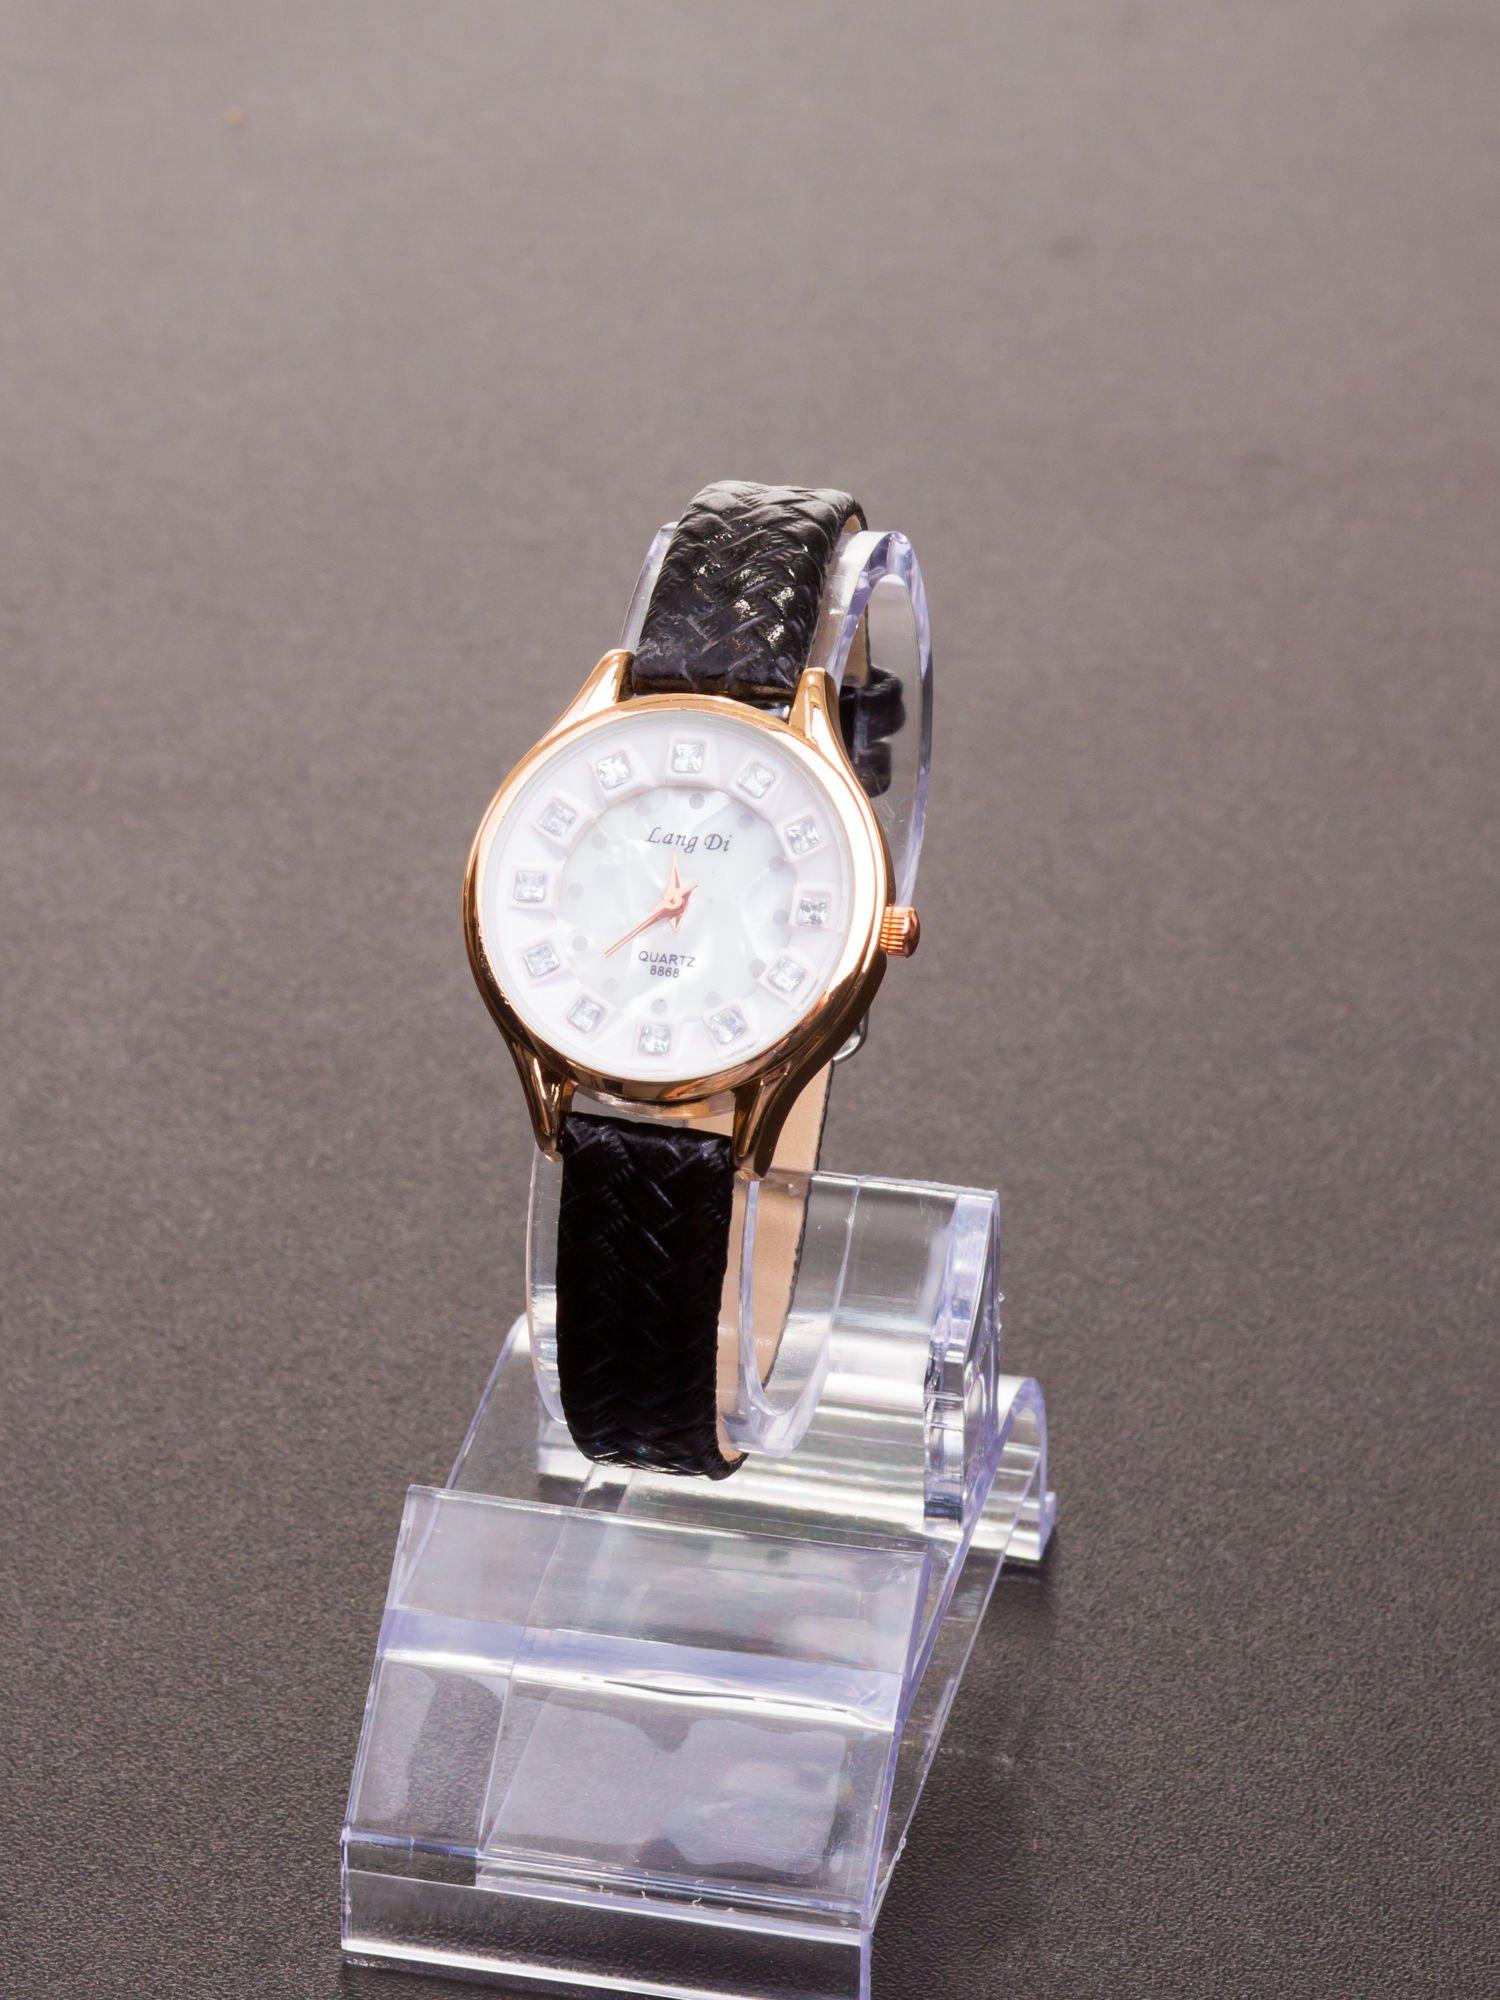 Damski zegarek                                   zdj.                                  3